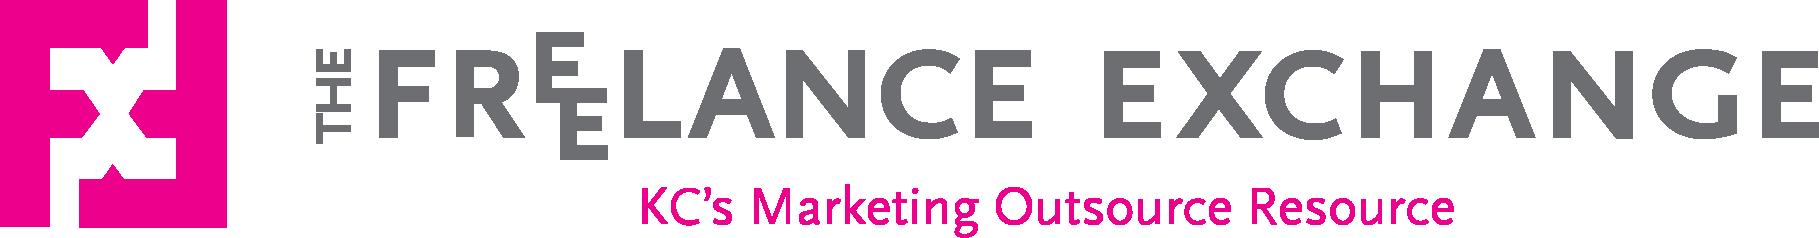 fxkc-logo.png